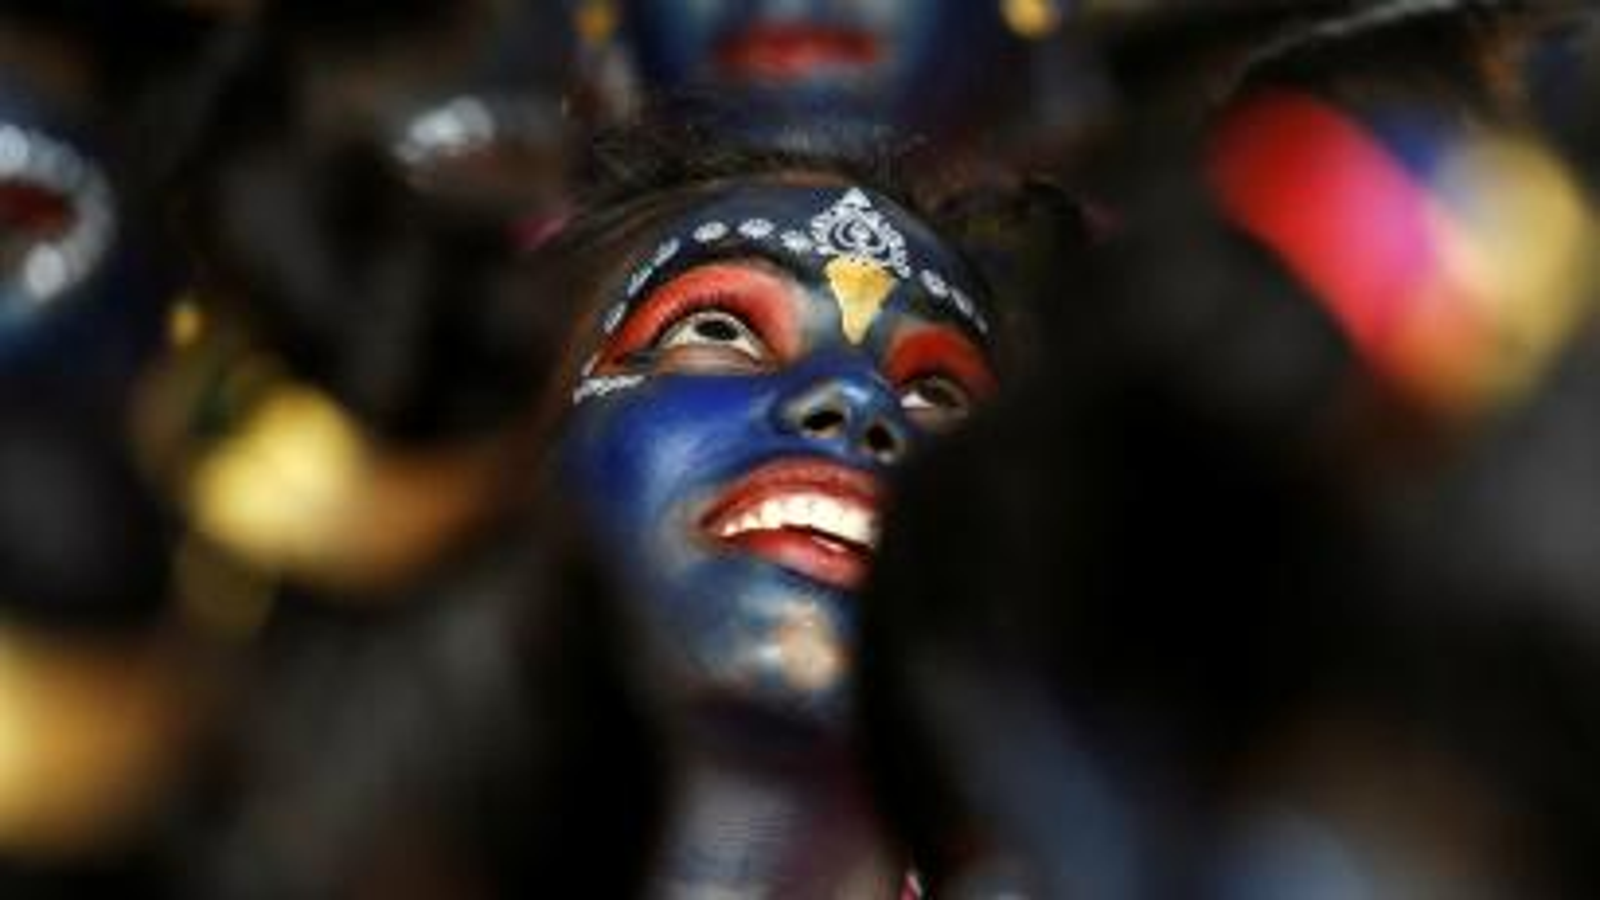 Janmashtami: Happy birthday Krishna, the sensual, free